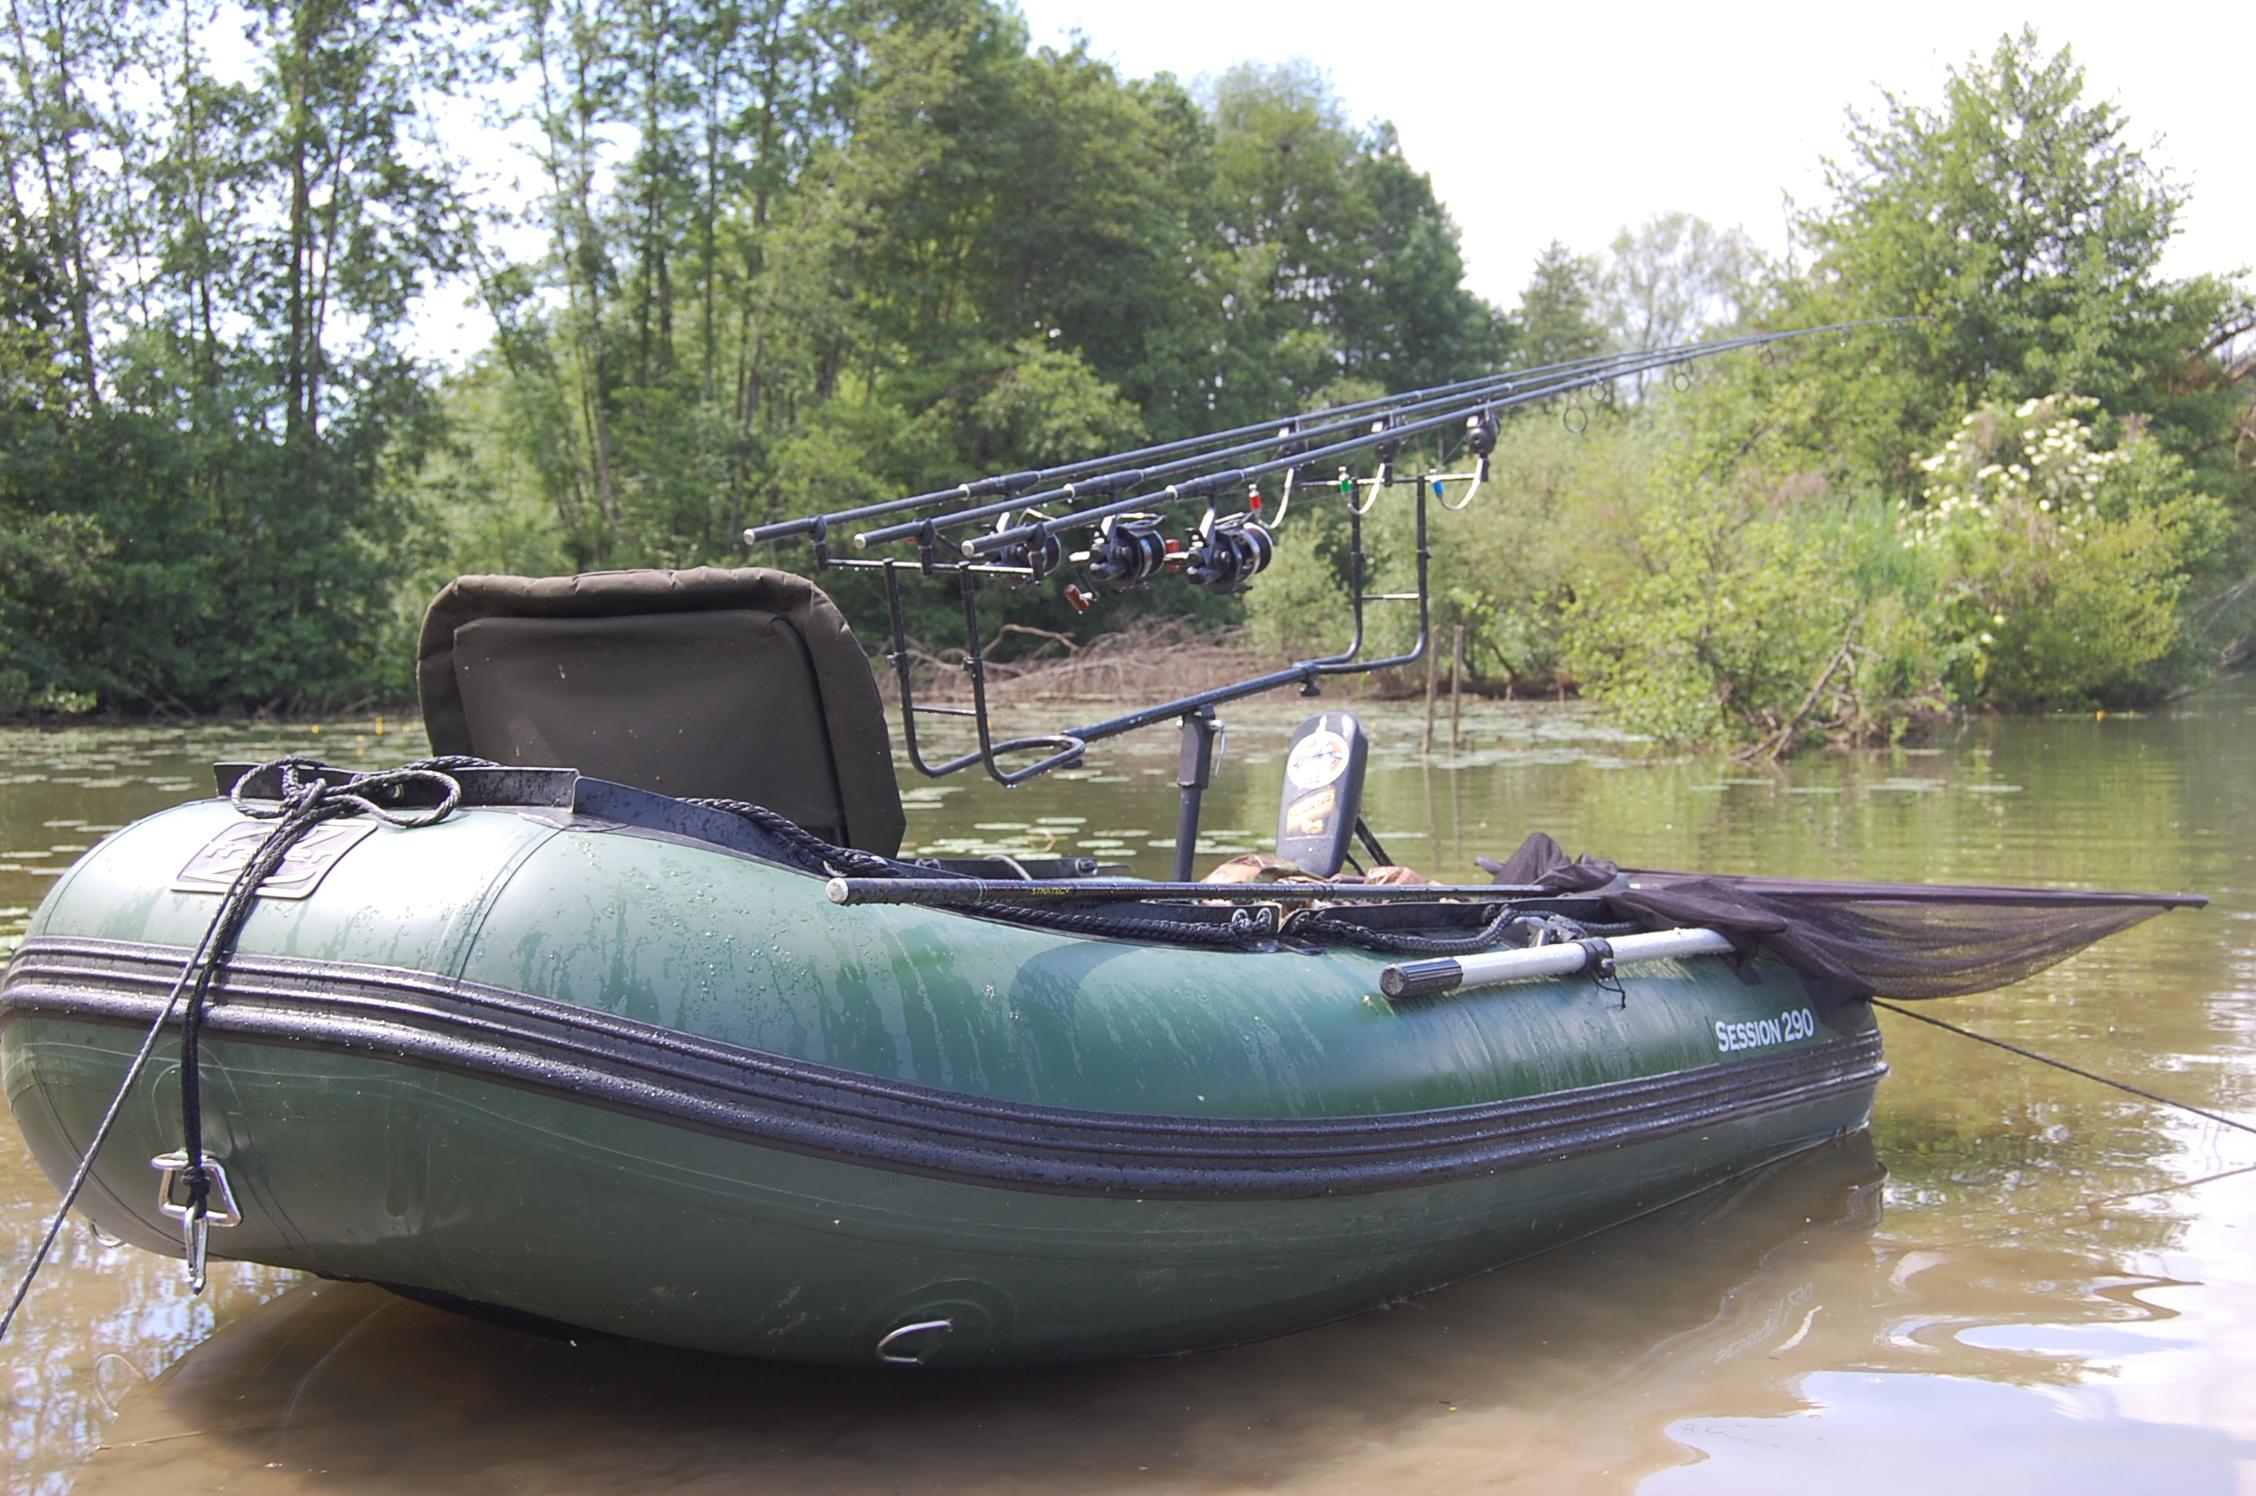 bateau pneumatique quicksilver occasion